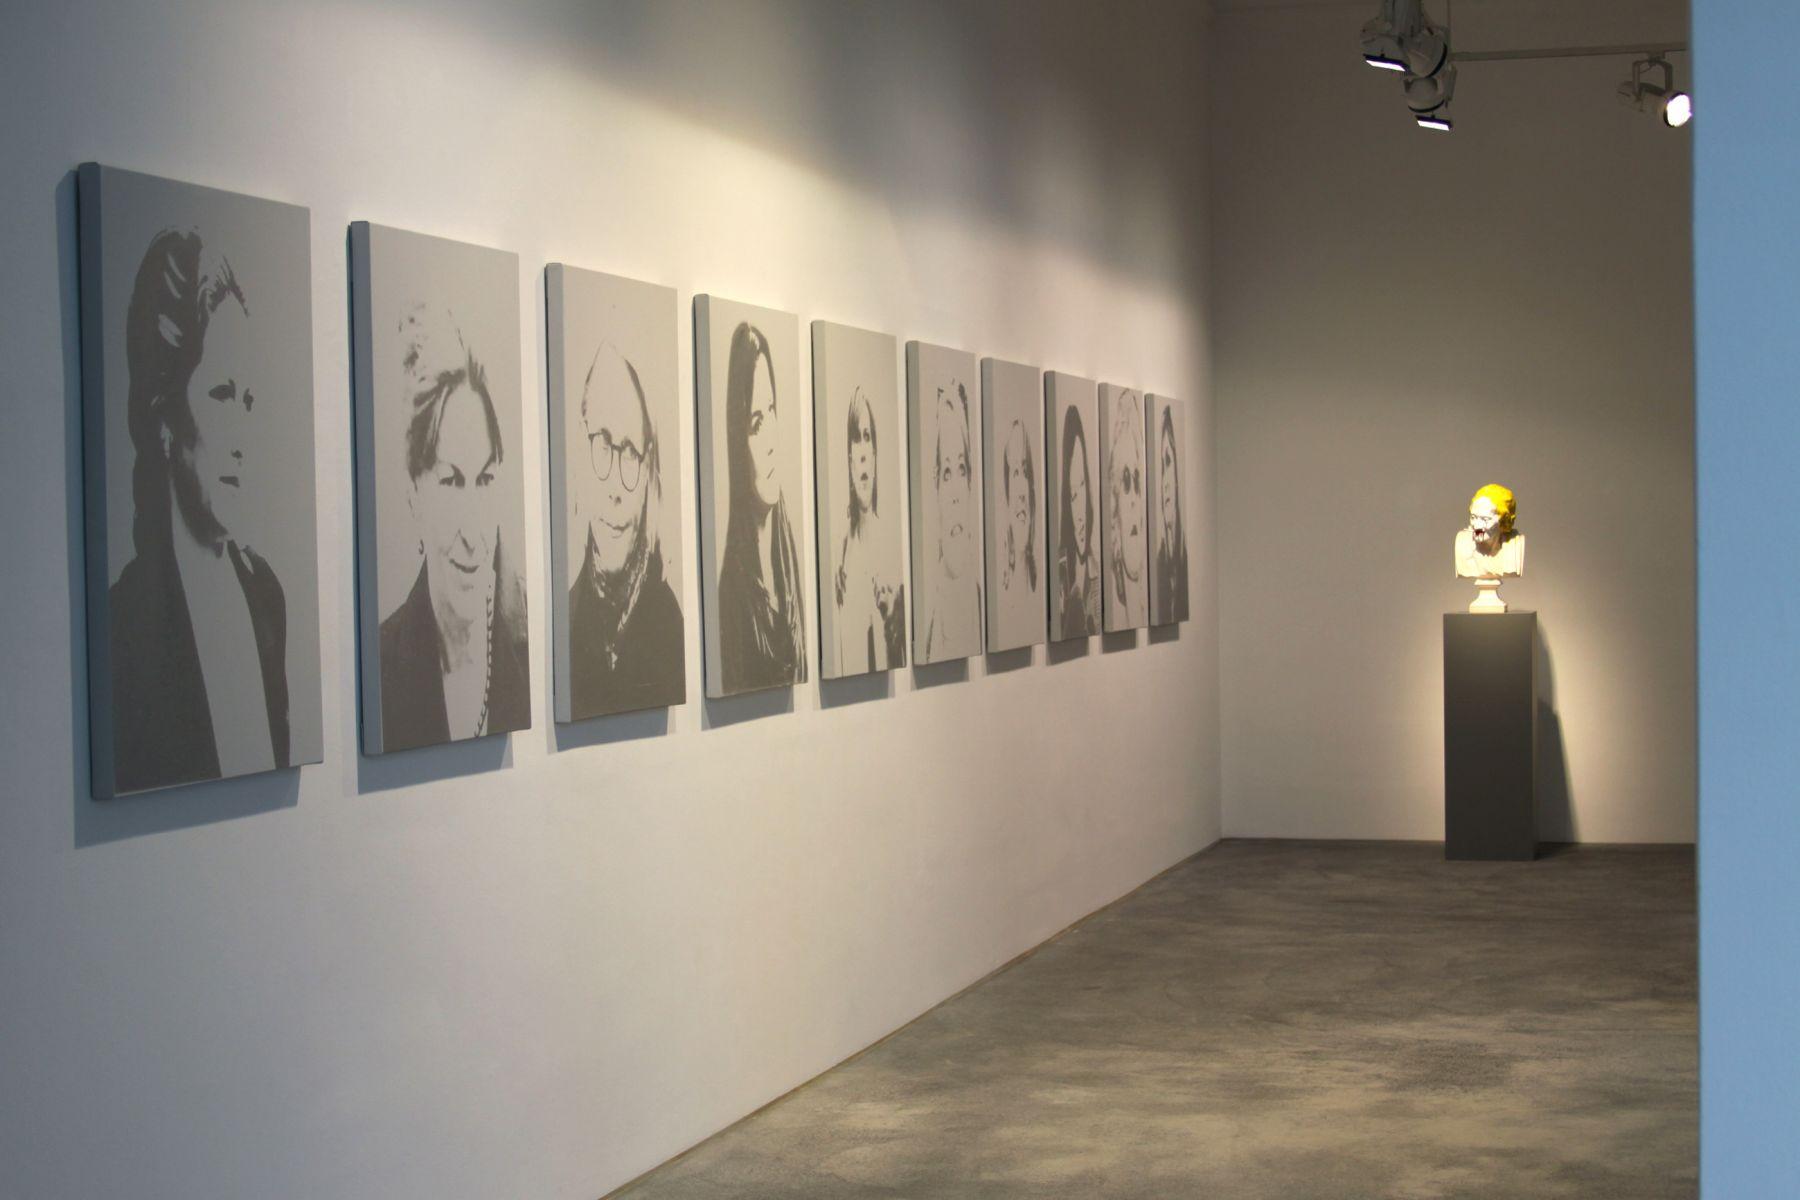 Installation view, The Bruce High Quality Foundation,The Retrospective: 2001-2010,â€‹Galerie Bruno Bischofberger, Zurich, 2010